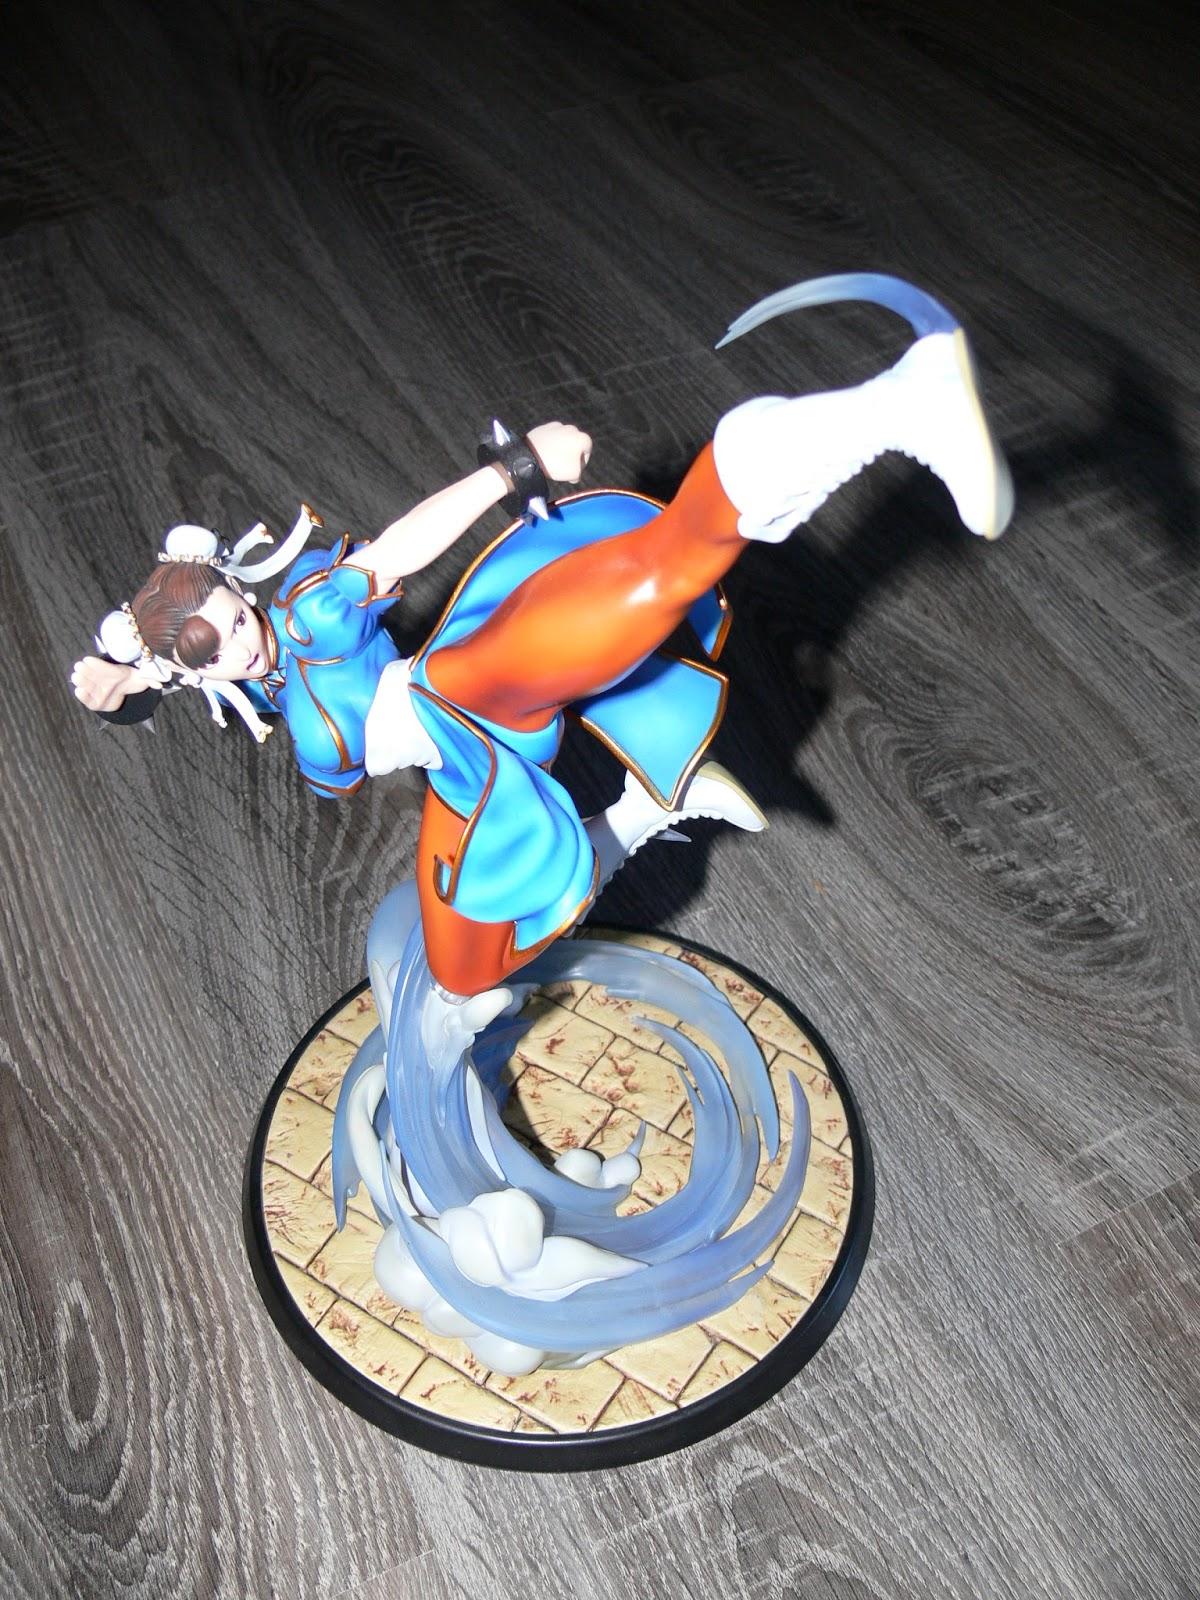 Notre Critique De La Figurine Chun Li By Tsume Nipponzilla Art Vega Arcade Super Street Fighter Iv Edition Goodies